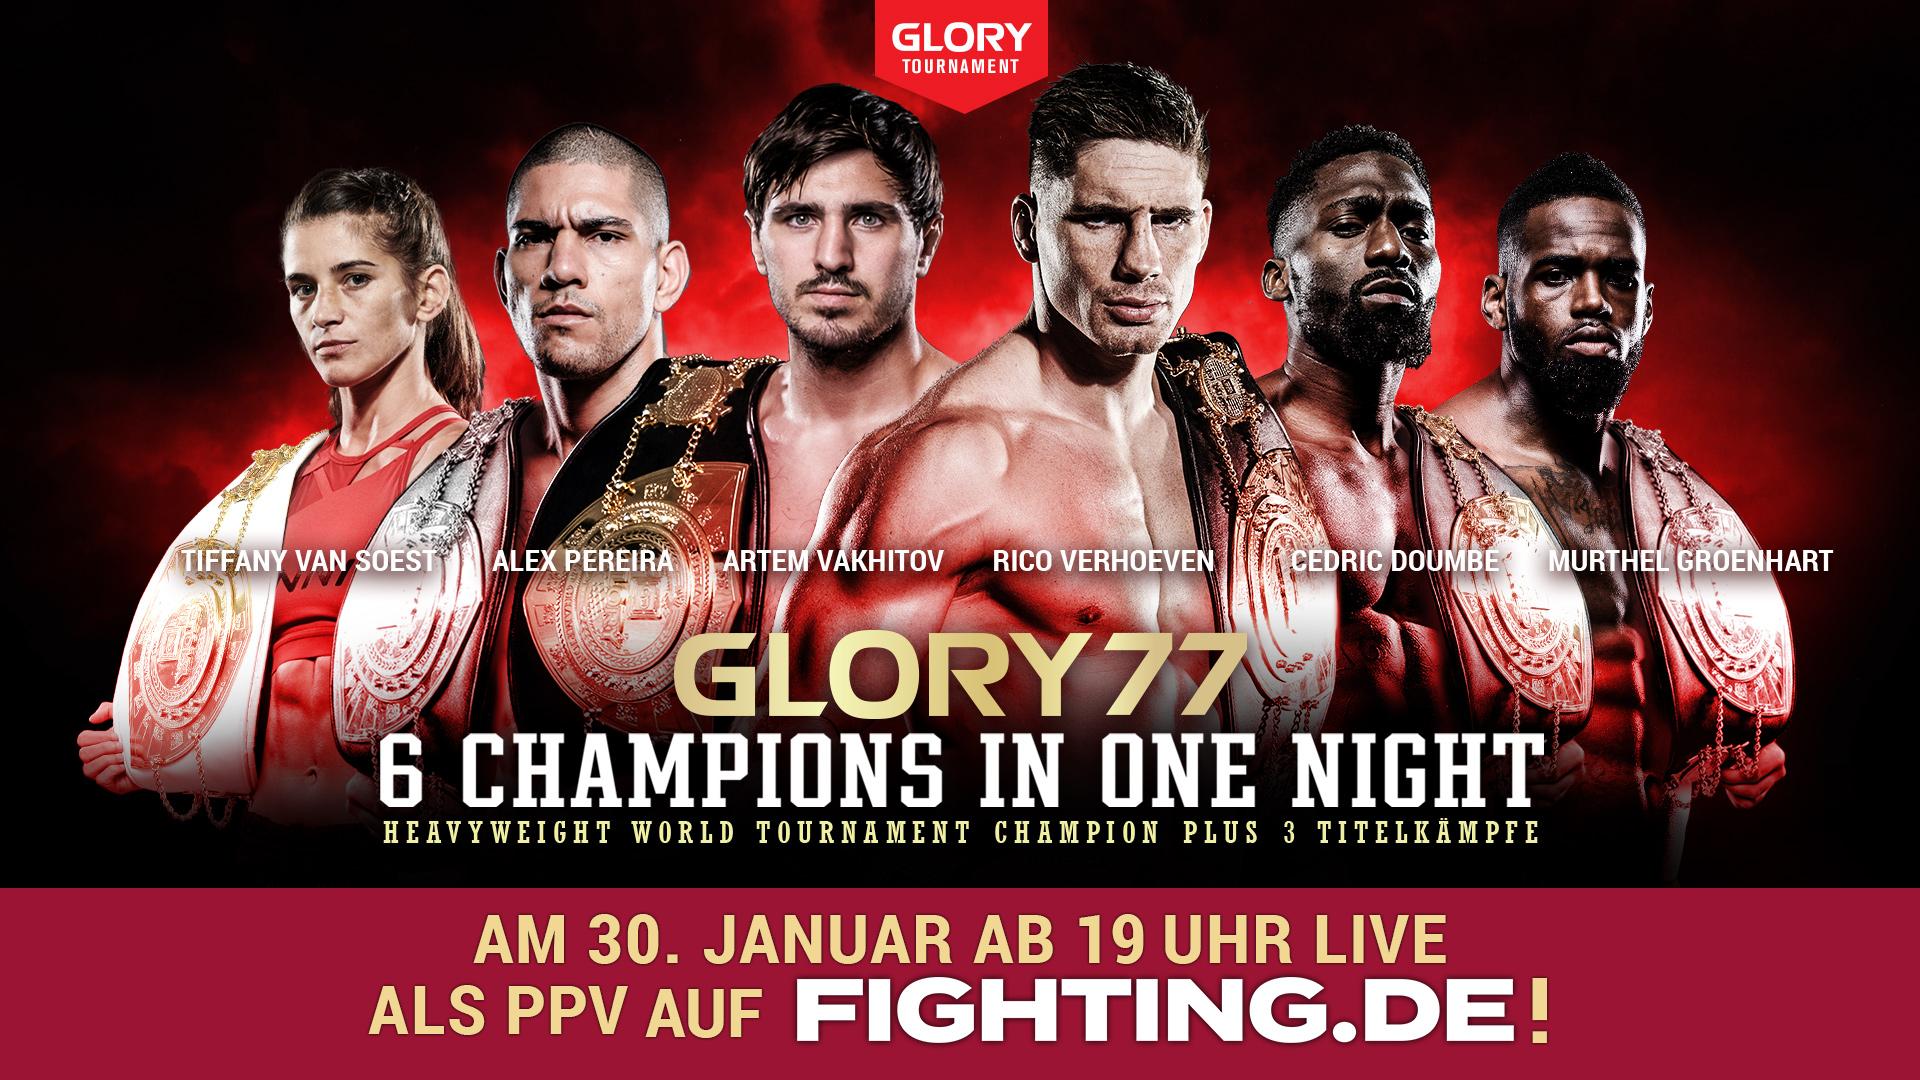 Glory 77 - fighting